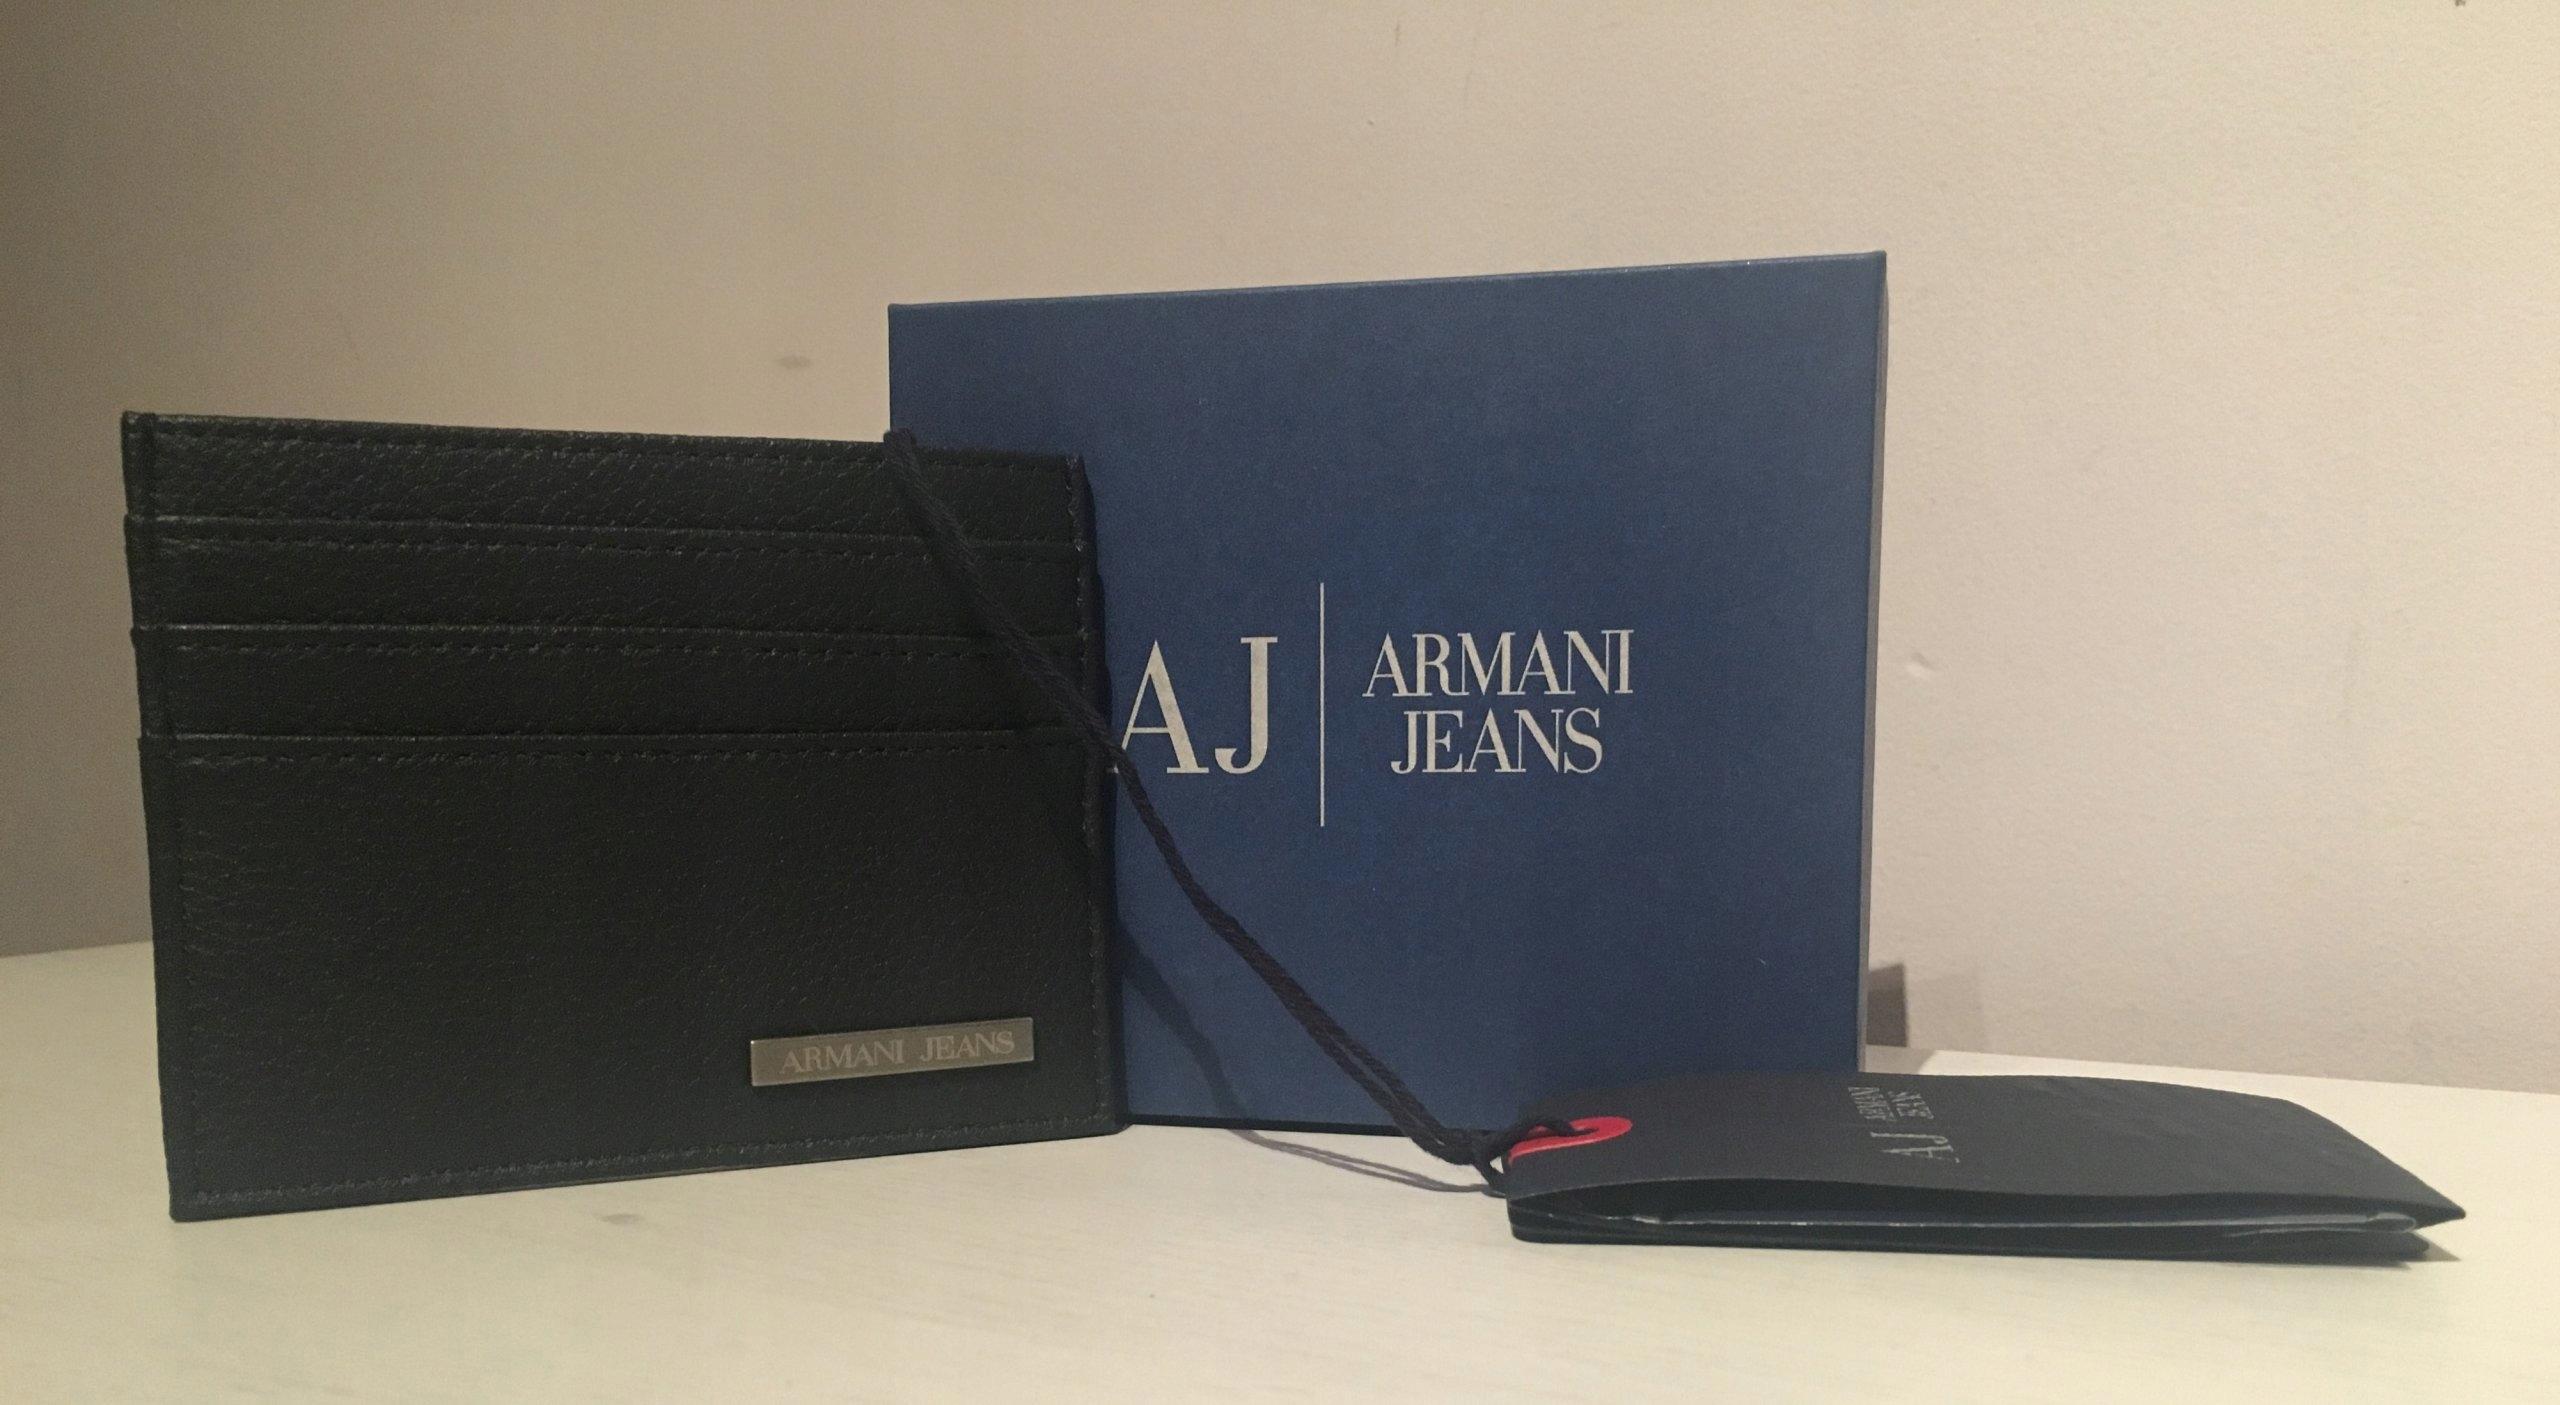 81c3002d7985c ARMANI JEANS ETUI NA KARTY KREDYTOWE NOWE USA HIT - 7584336275 ...